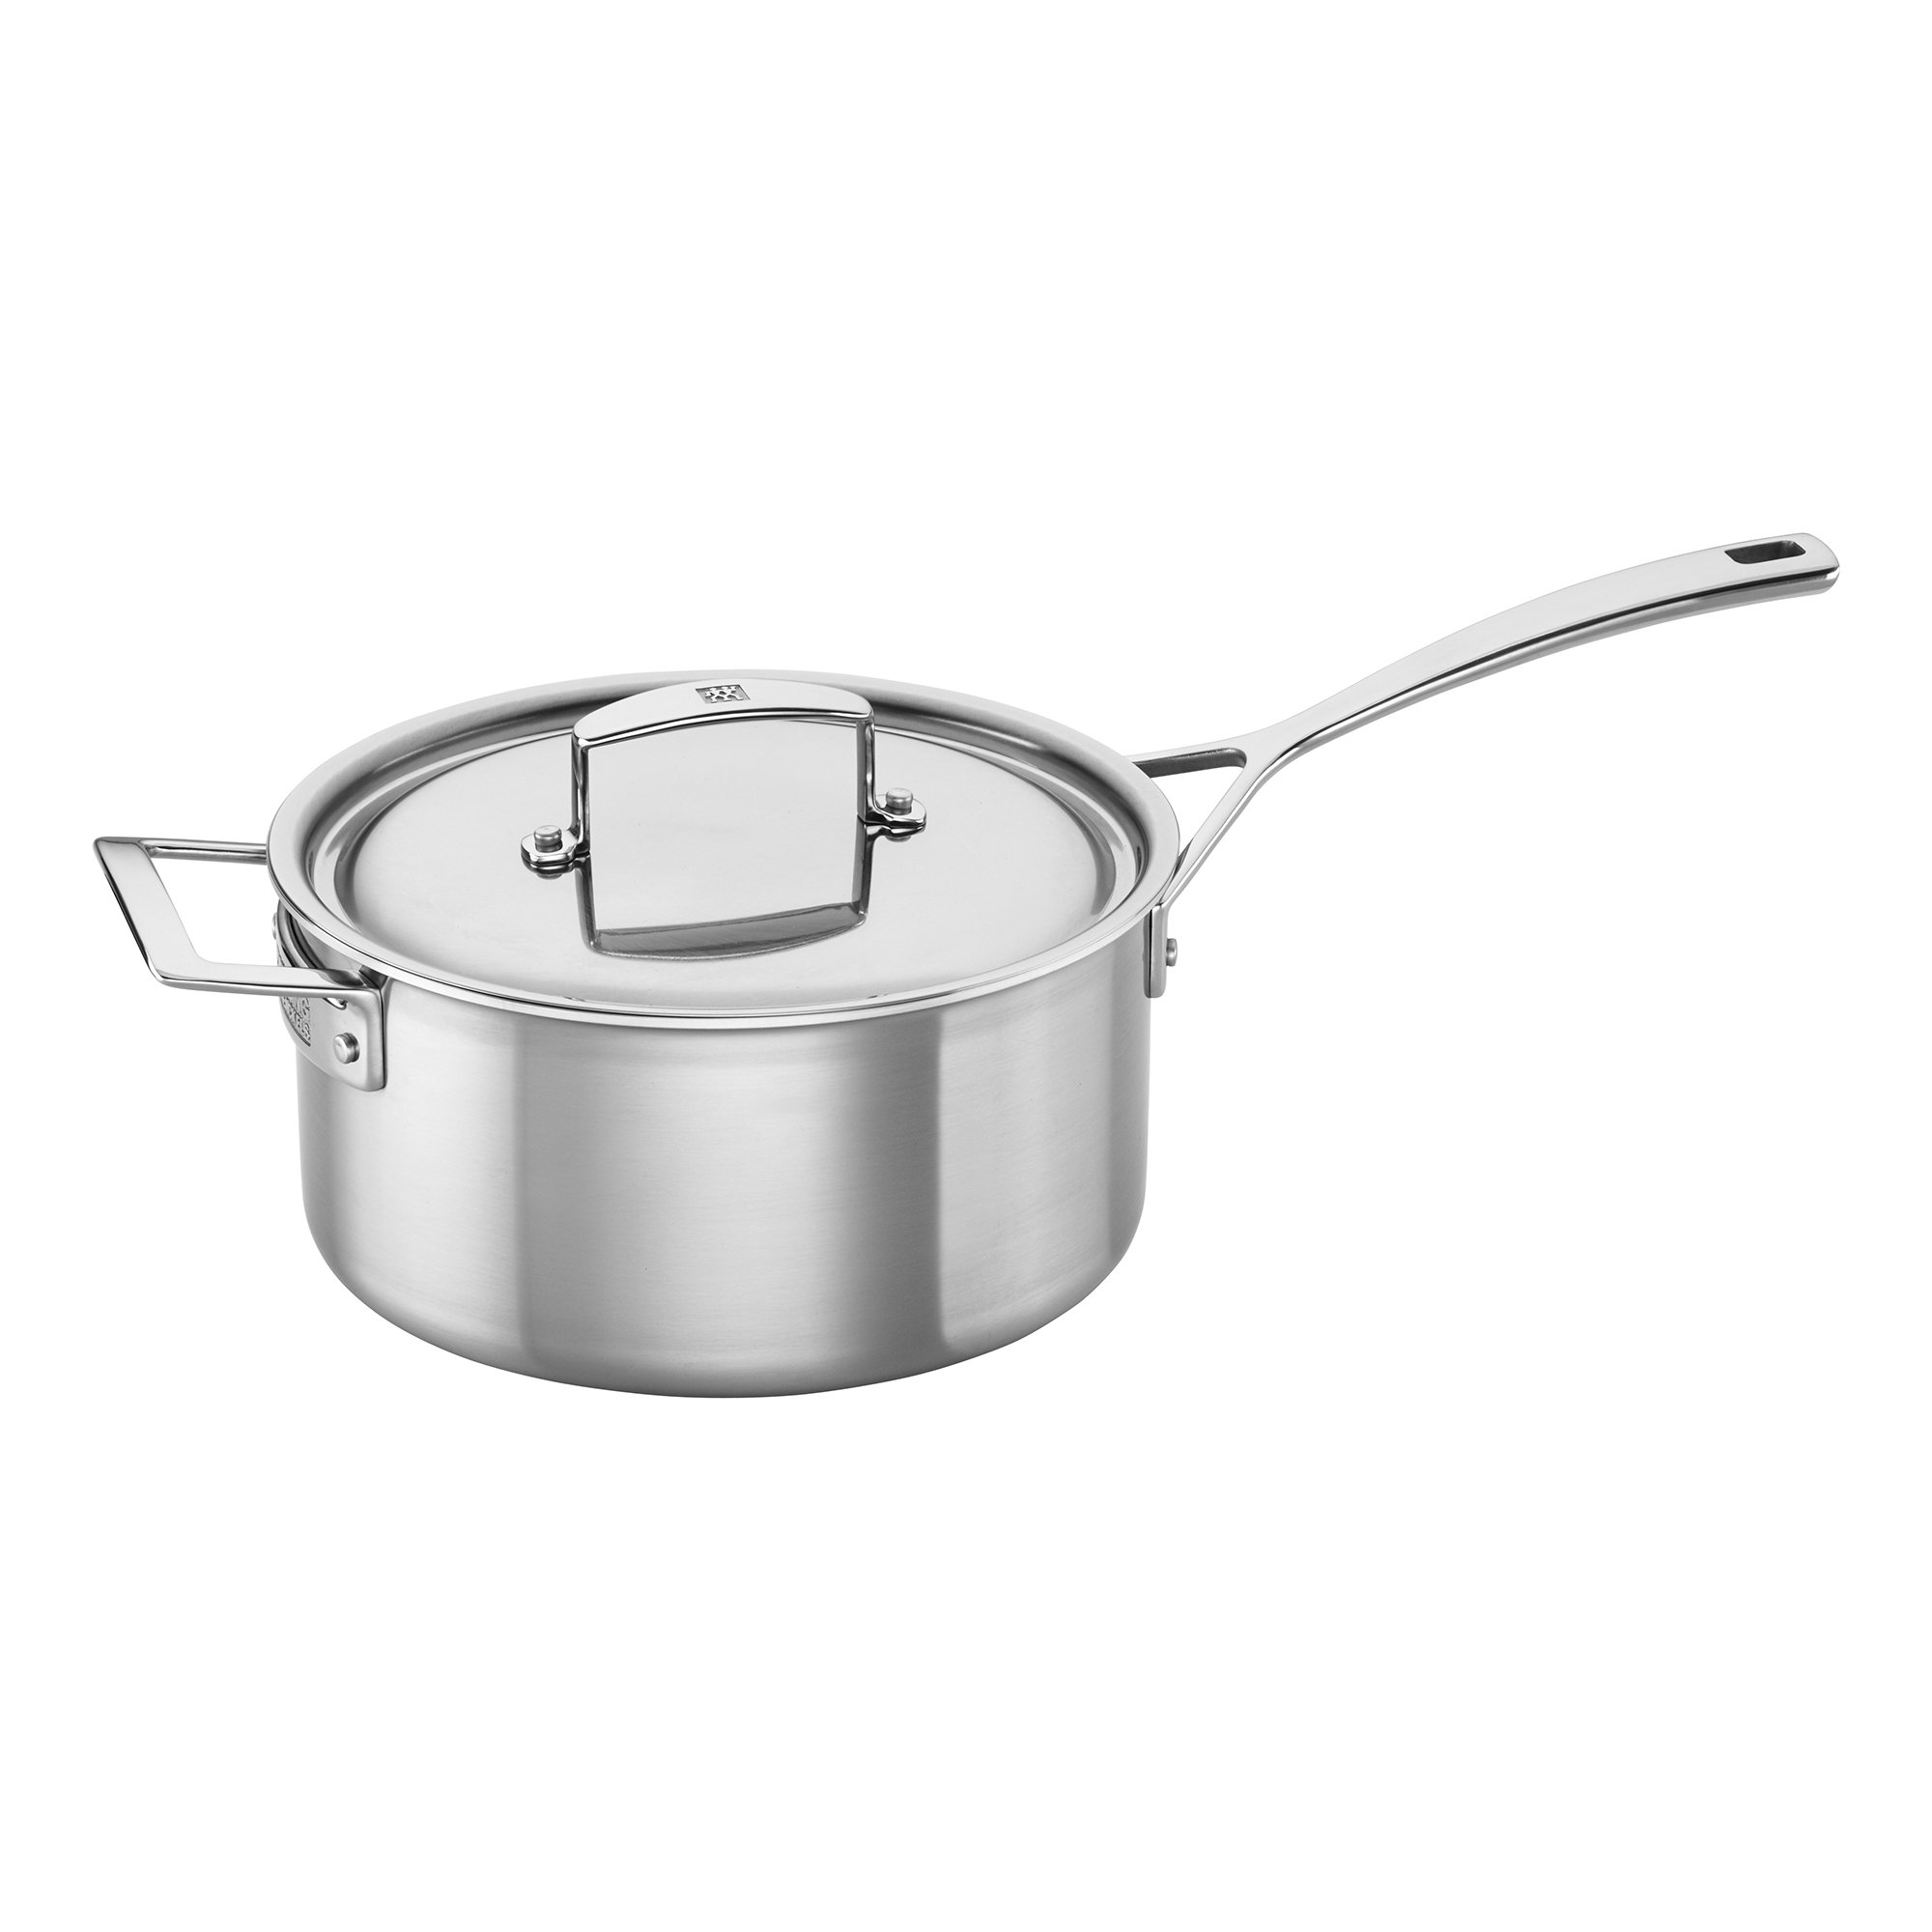 ZWILLING J.A. Henckels 66085-220 Aurora Saucepan, 4 Quart, Silver, Stainless Steel